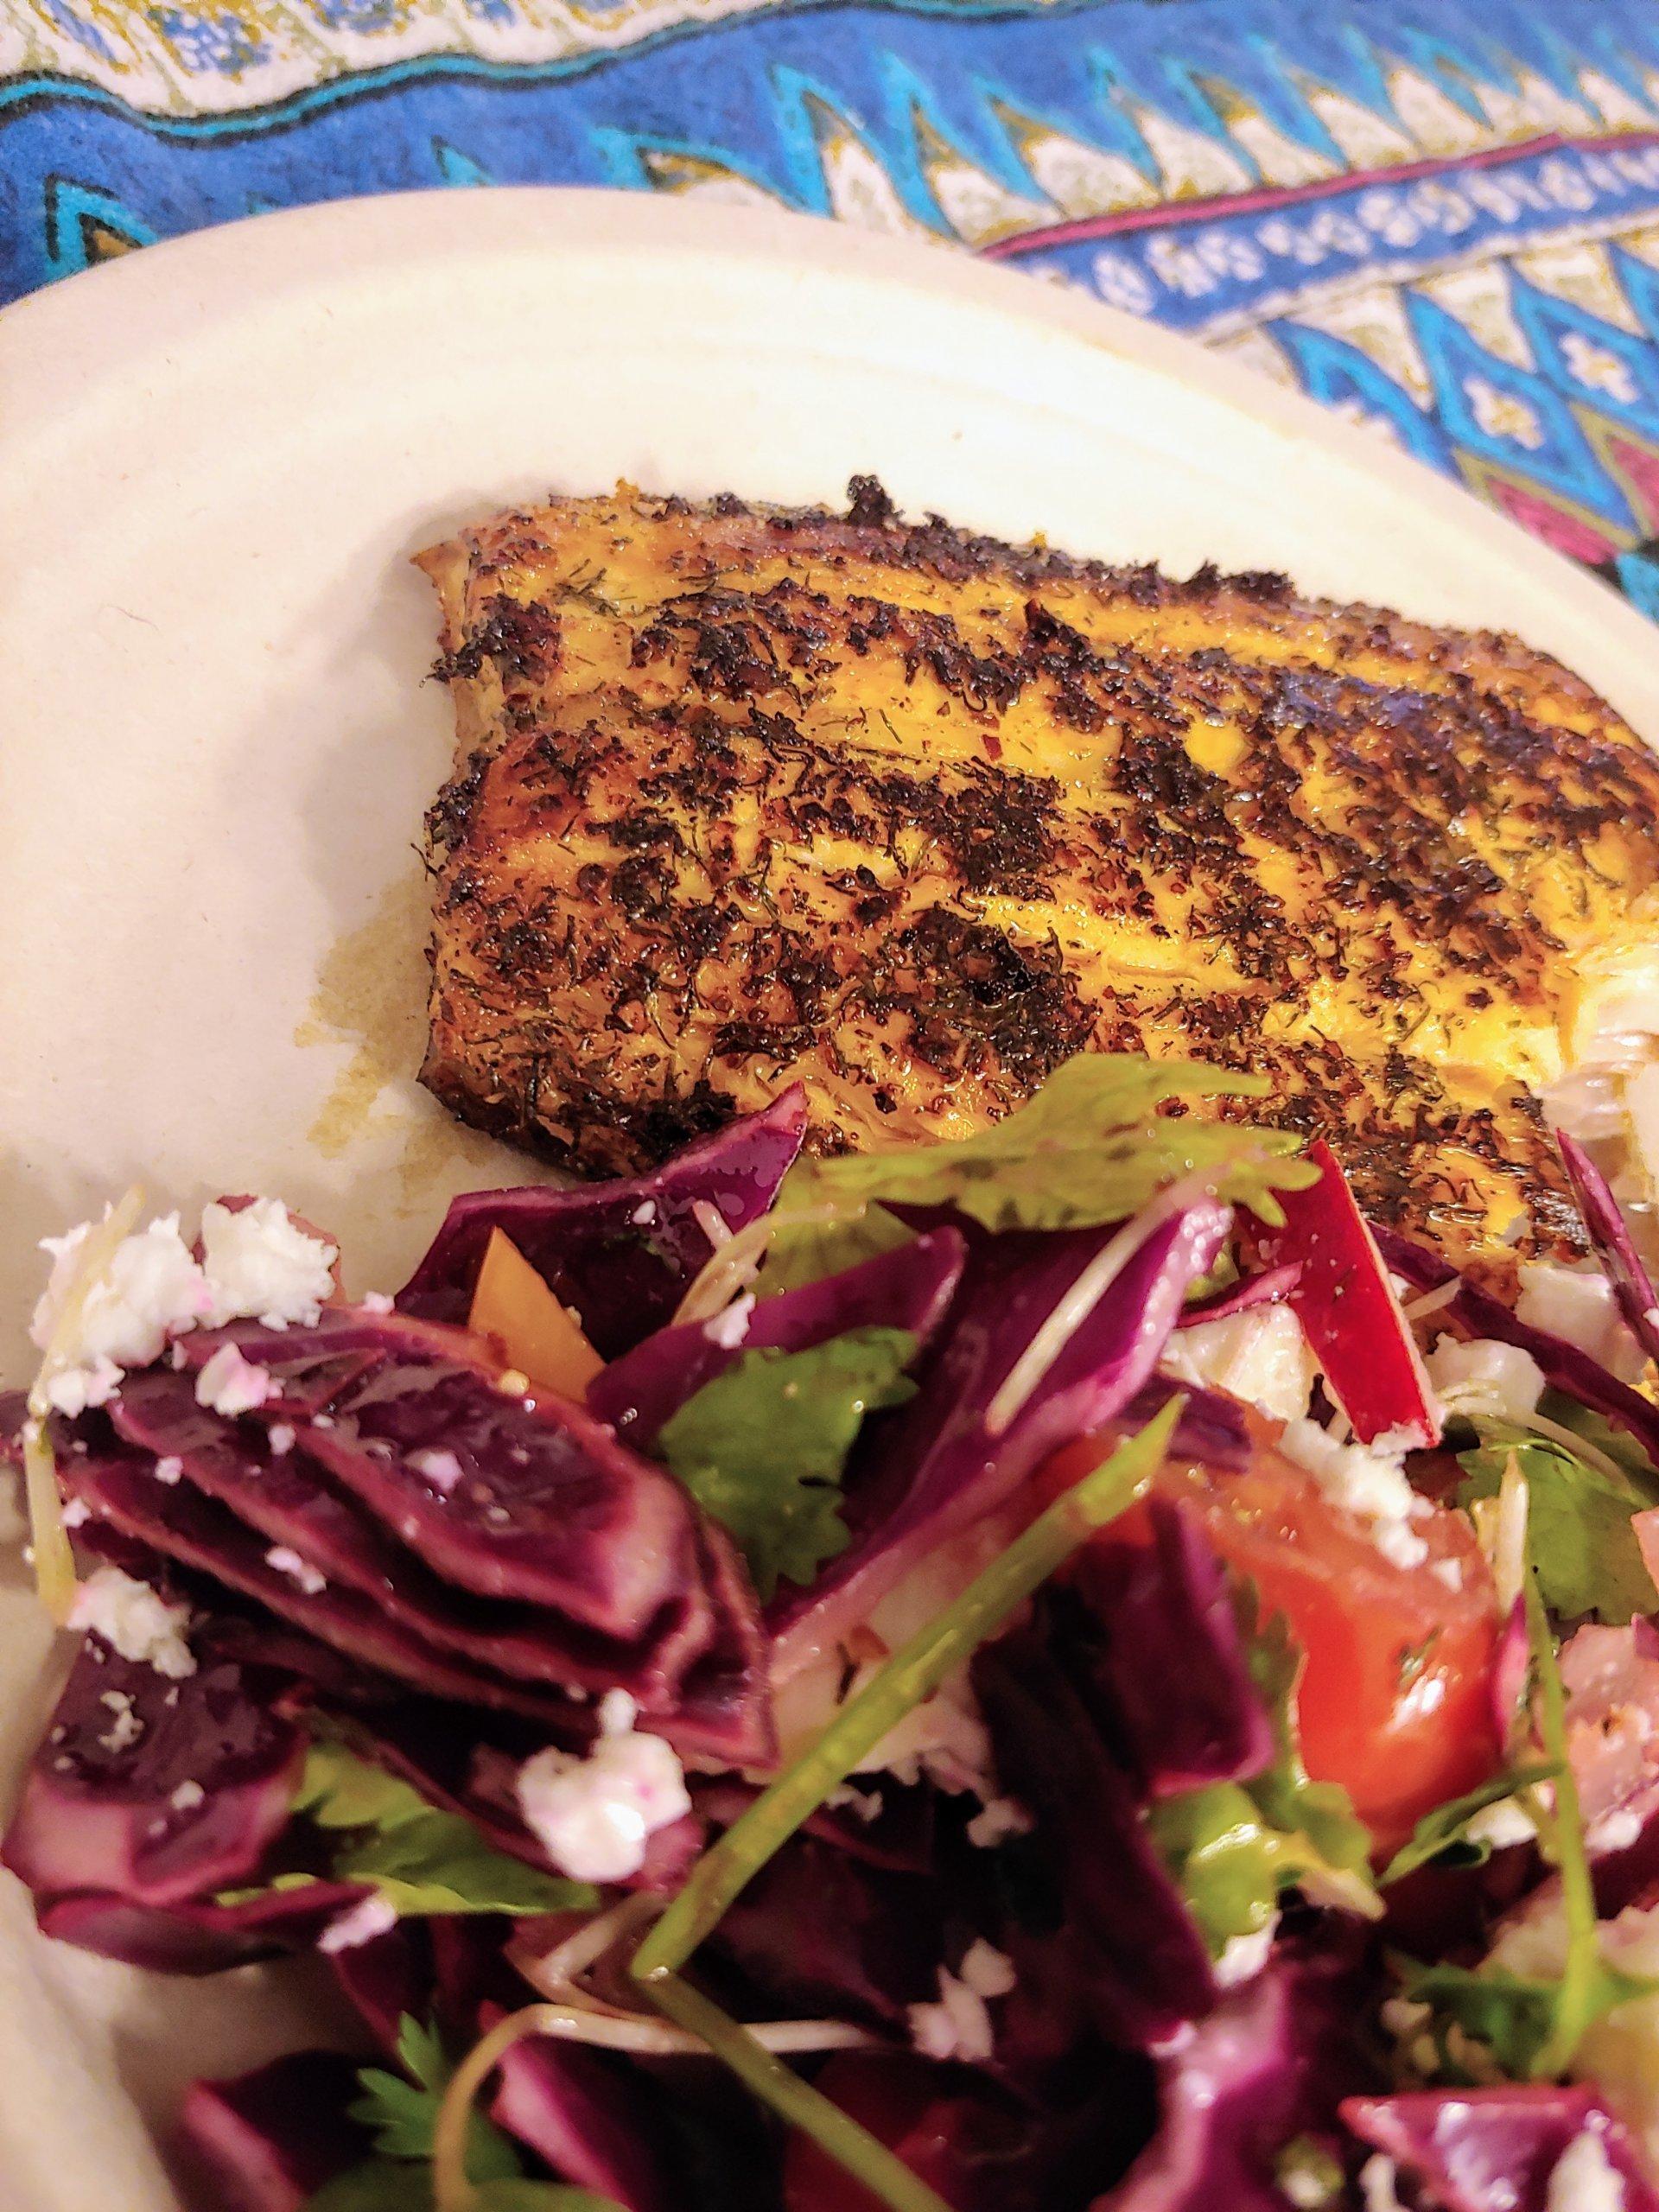 Seared Salmon and Savory Salad